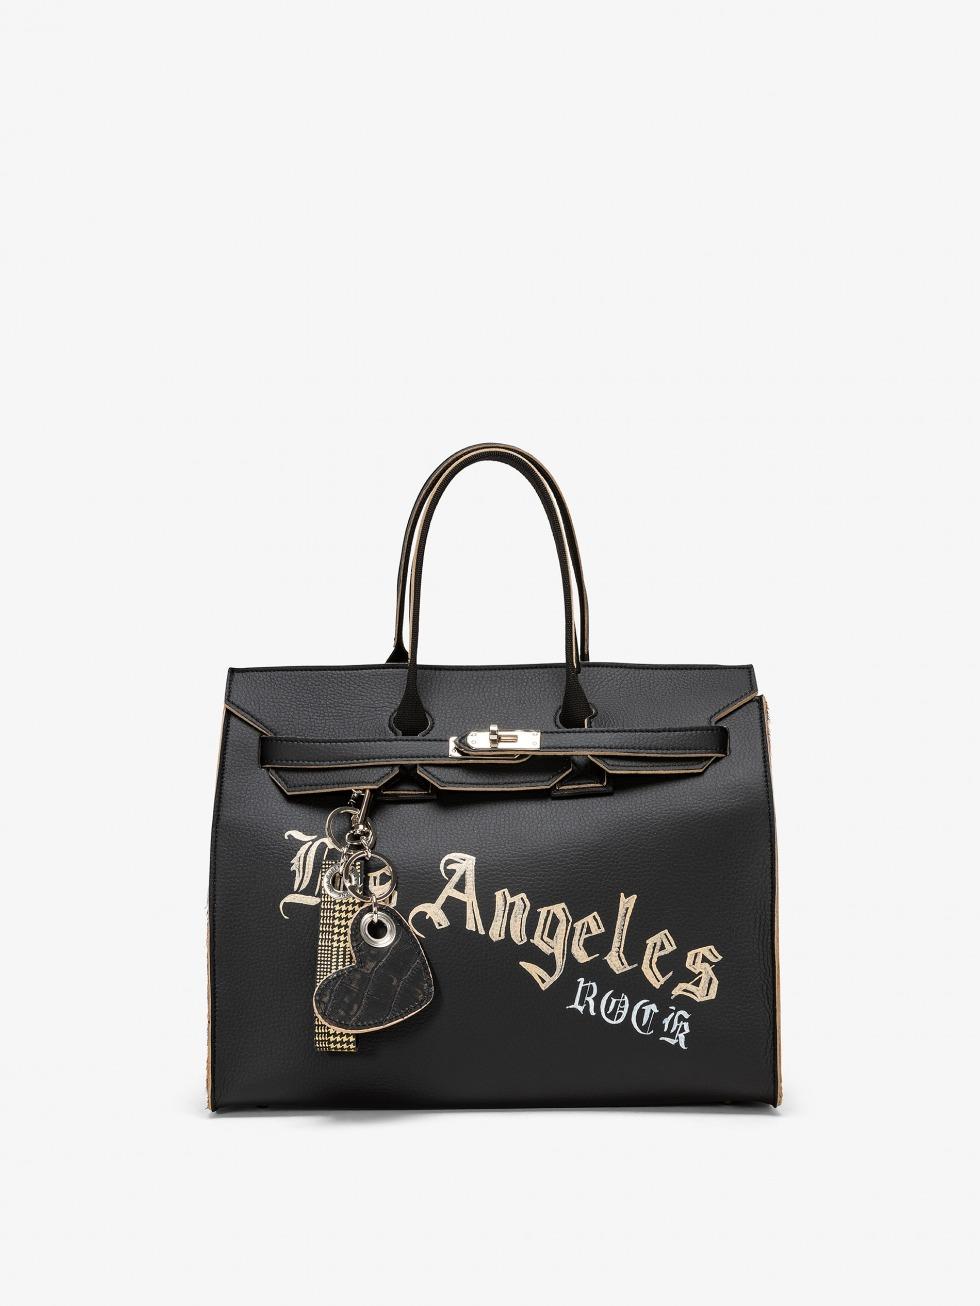 EASY HAND BAG - SAND LOS ANGELES ROCK